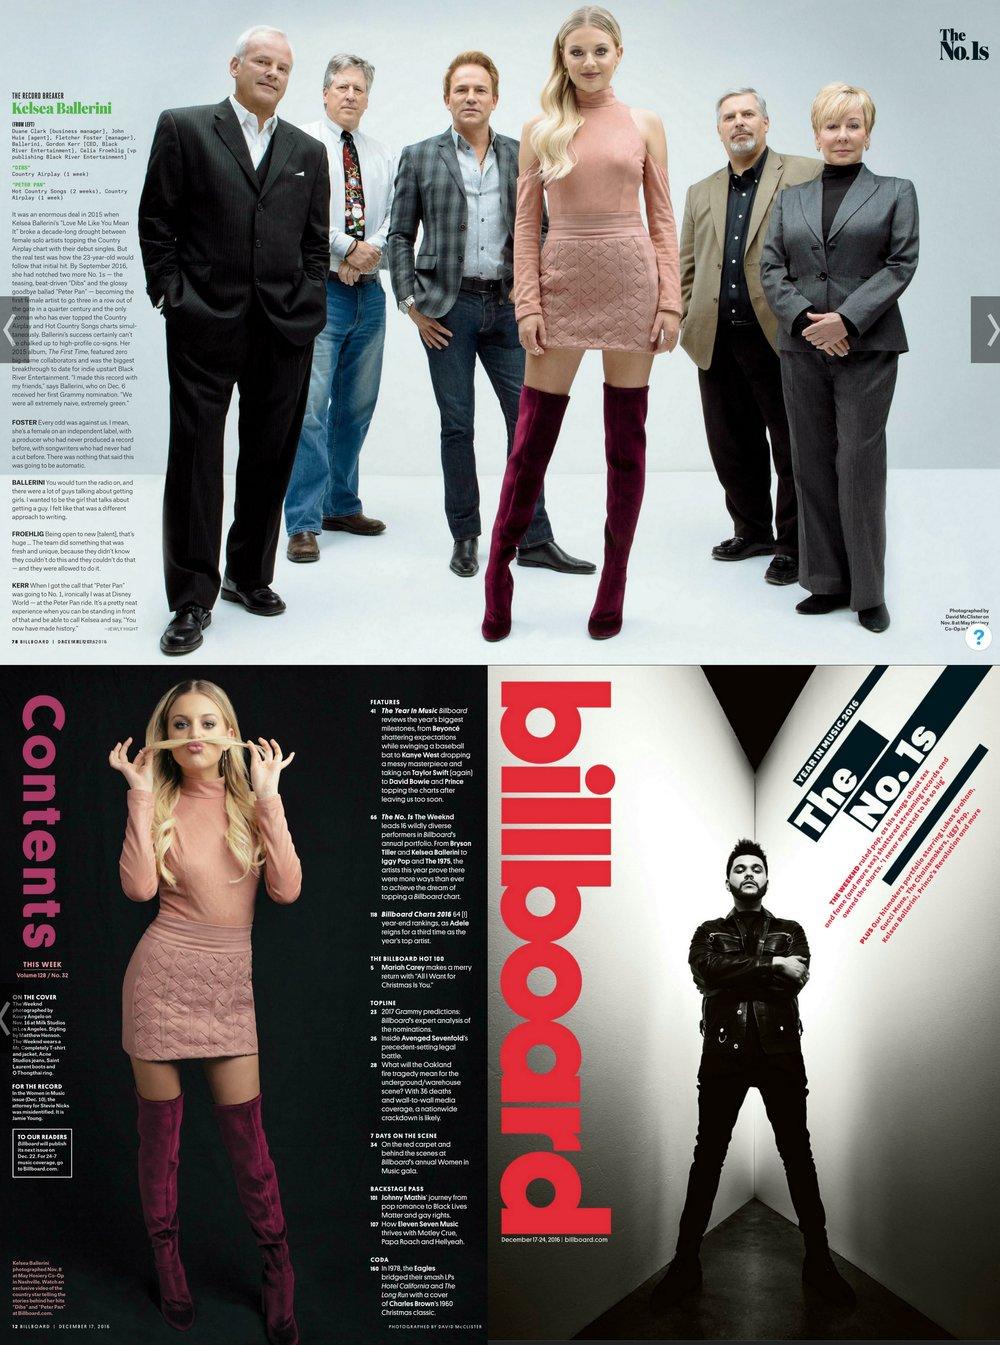 Billboard Magazine, Dec. 2016, #1's of 2016, The Record Breaker, Kelsea Ballerini